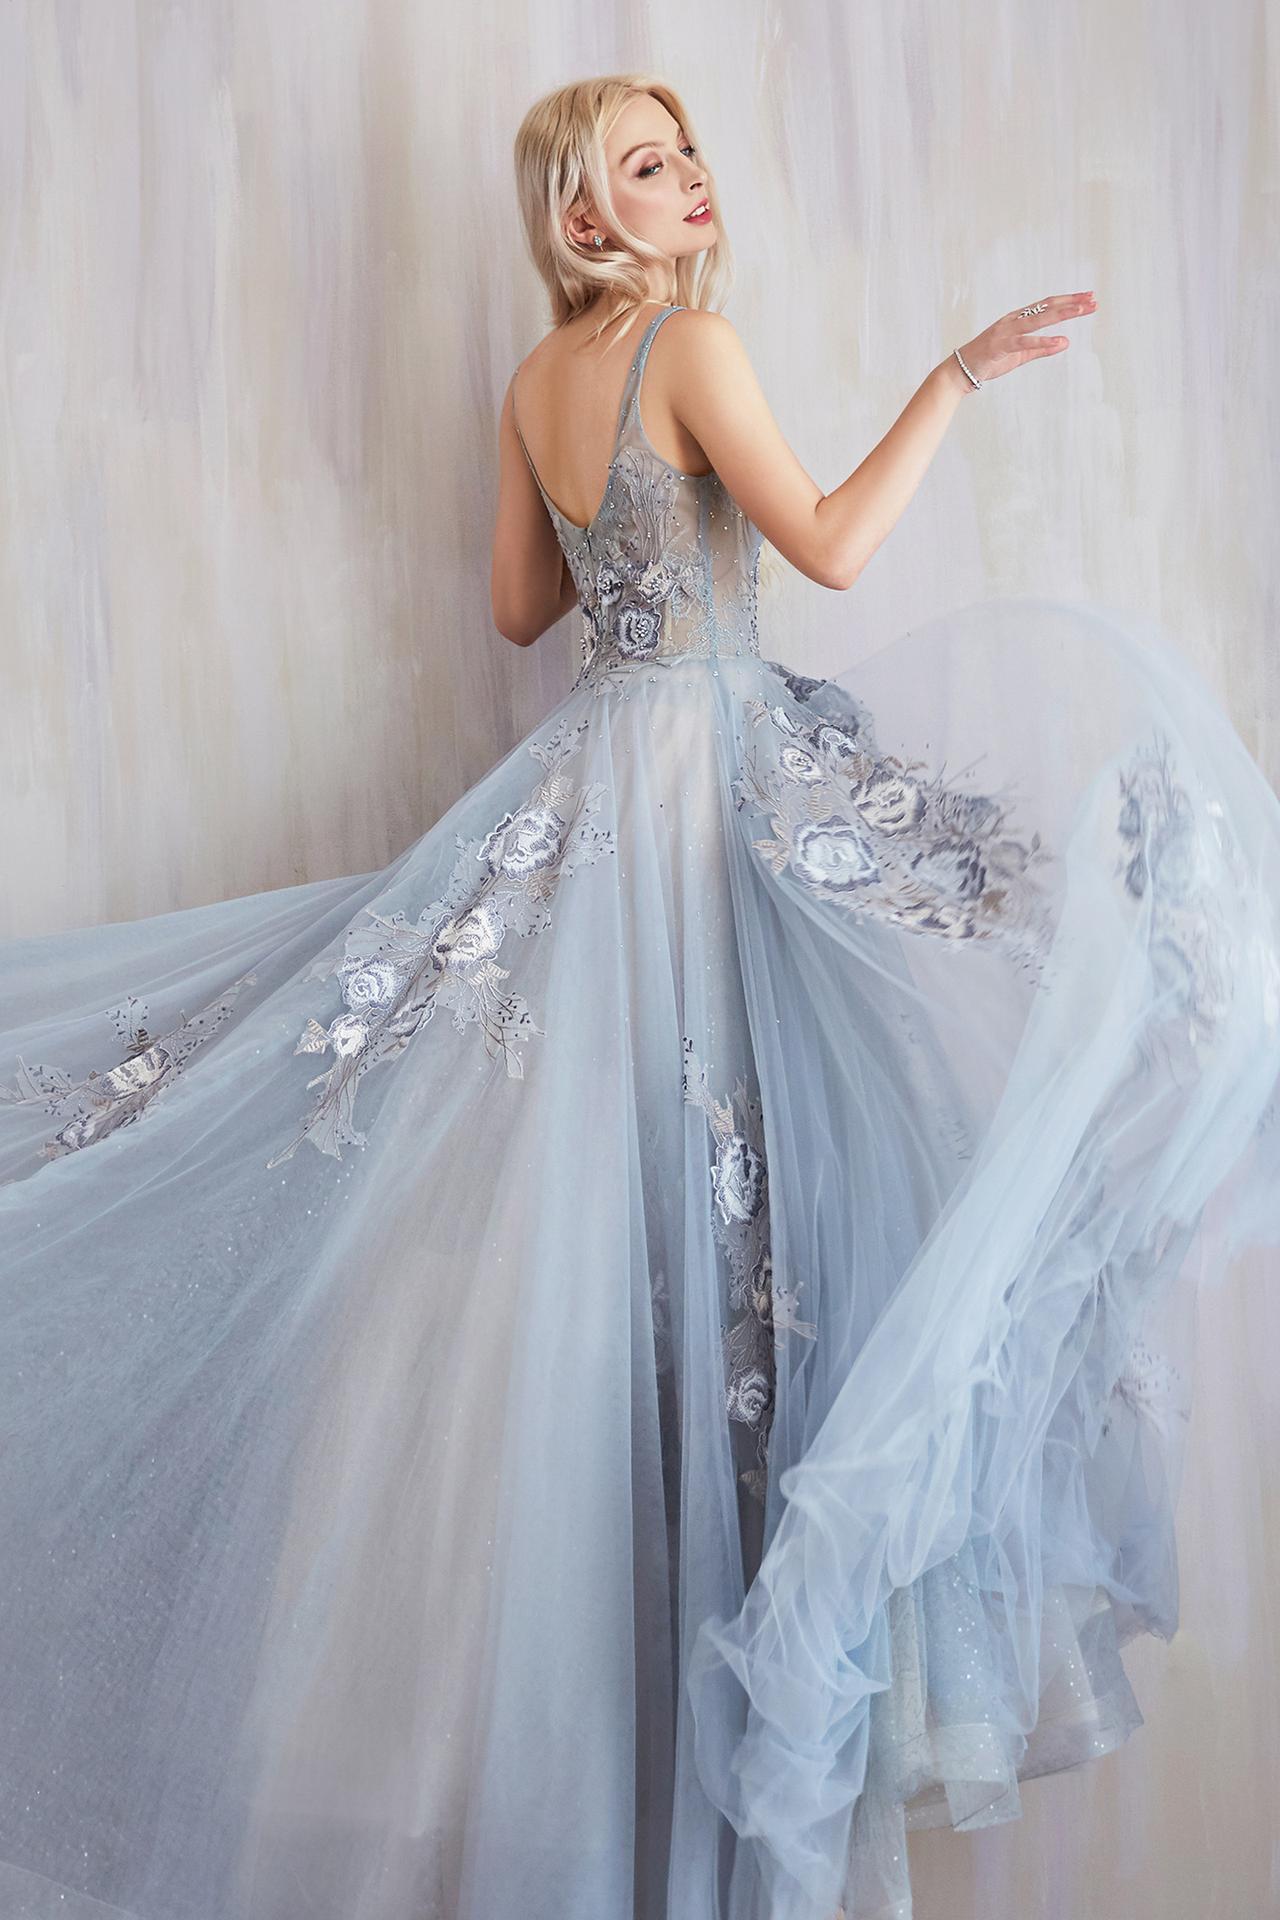 Nové spoločenské šaty :) - Obrázok č. 59